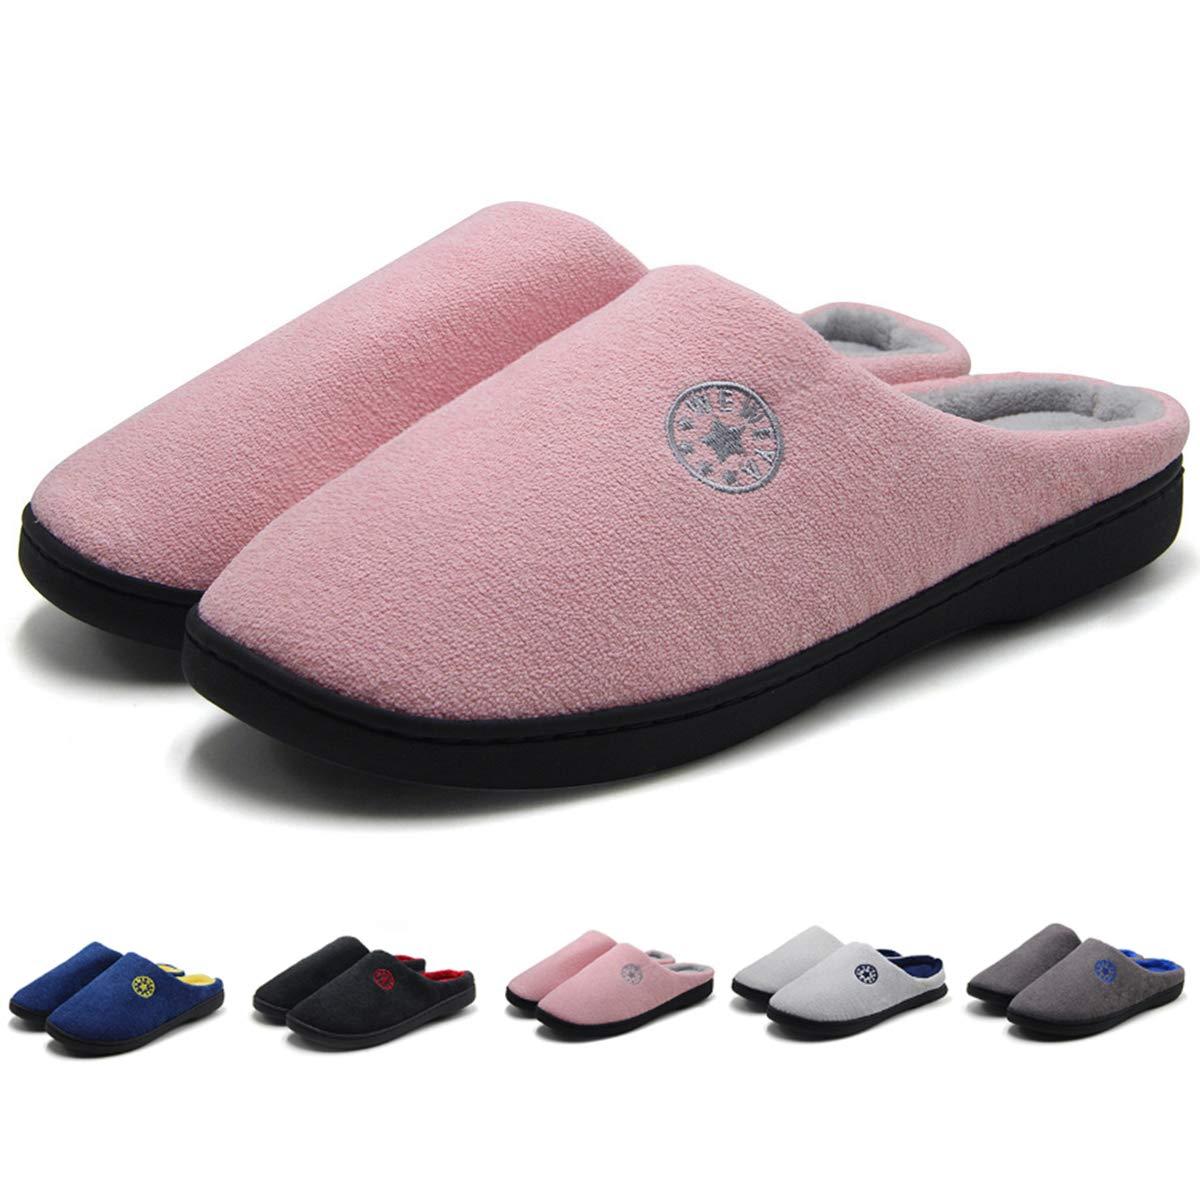 ziitop House Slipper Men Women Memory Foam Slipper Soft Comfort Slip on Clog House Shoes Indoor Slippers